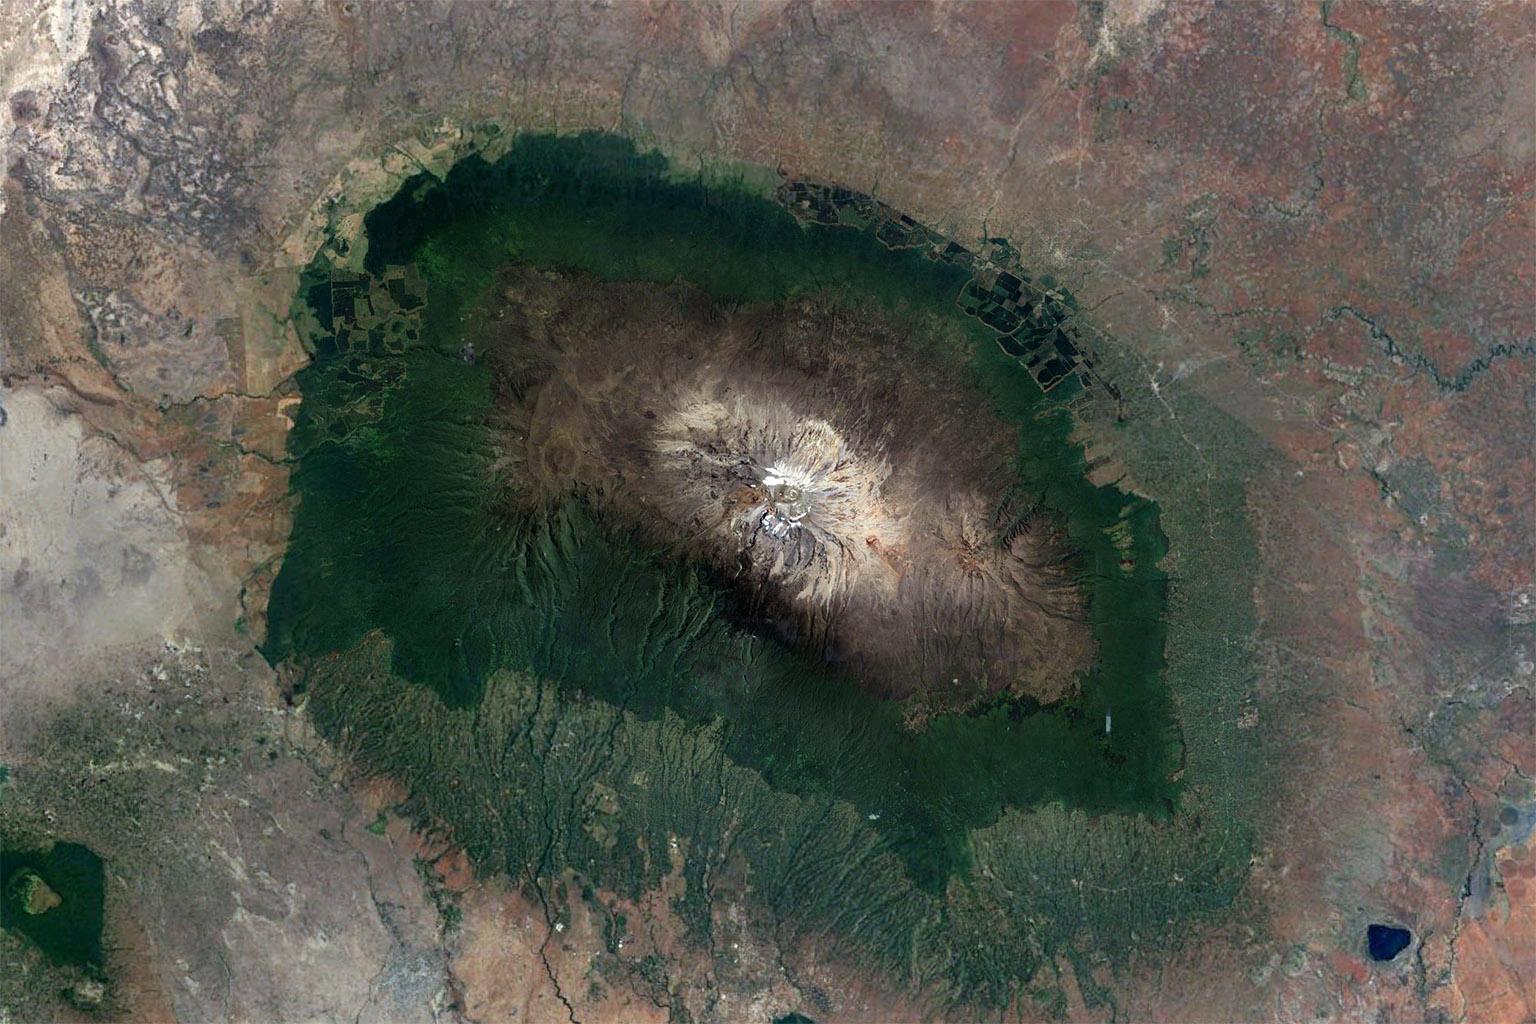 NASA Landsat satellite image of Mount Kilamanjaro in Tanzania. Marangu is on the southeastern slope.